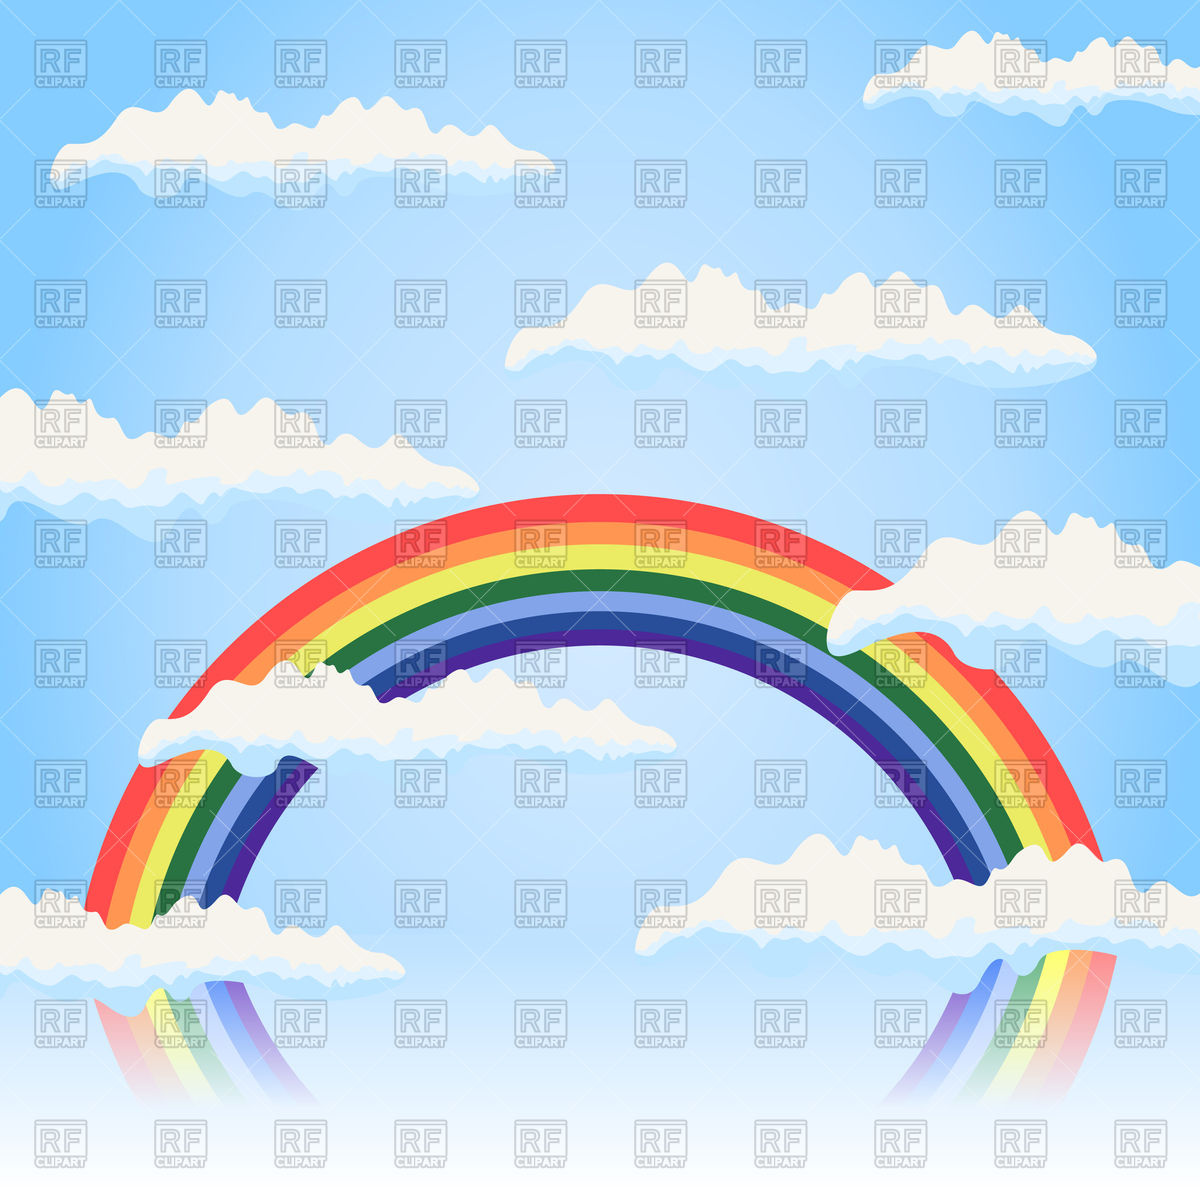 Rainbow in the blue sky Vector Image #82393.